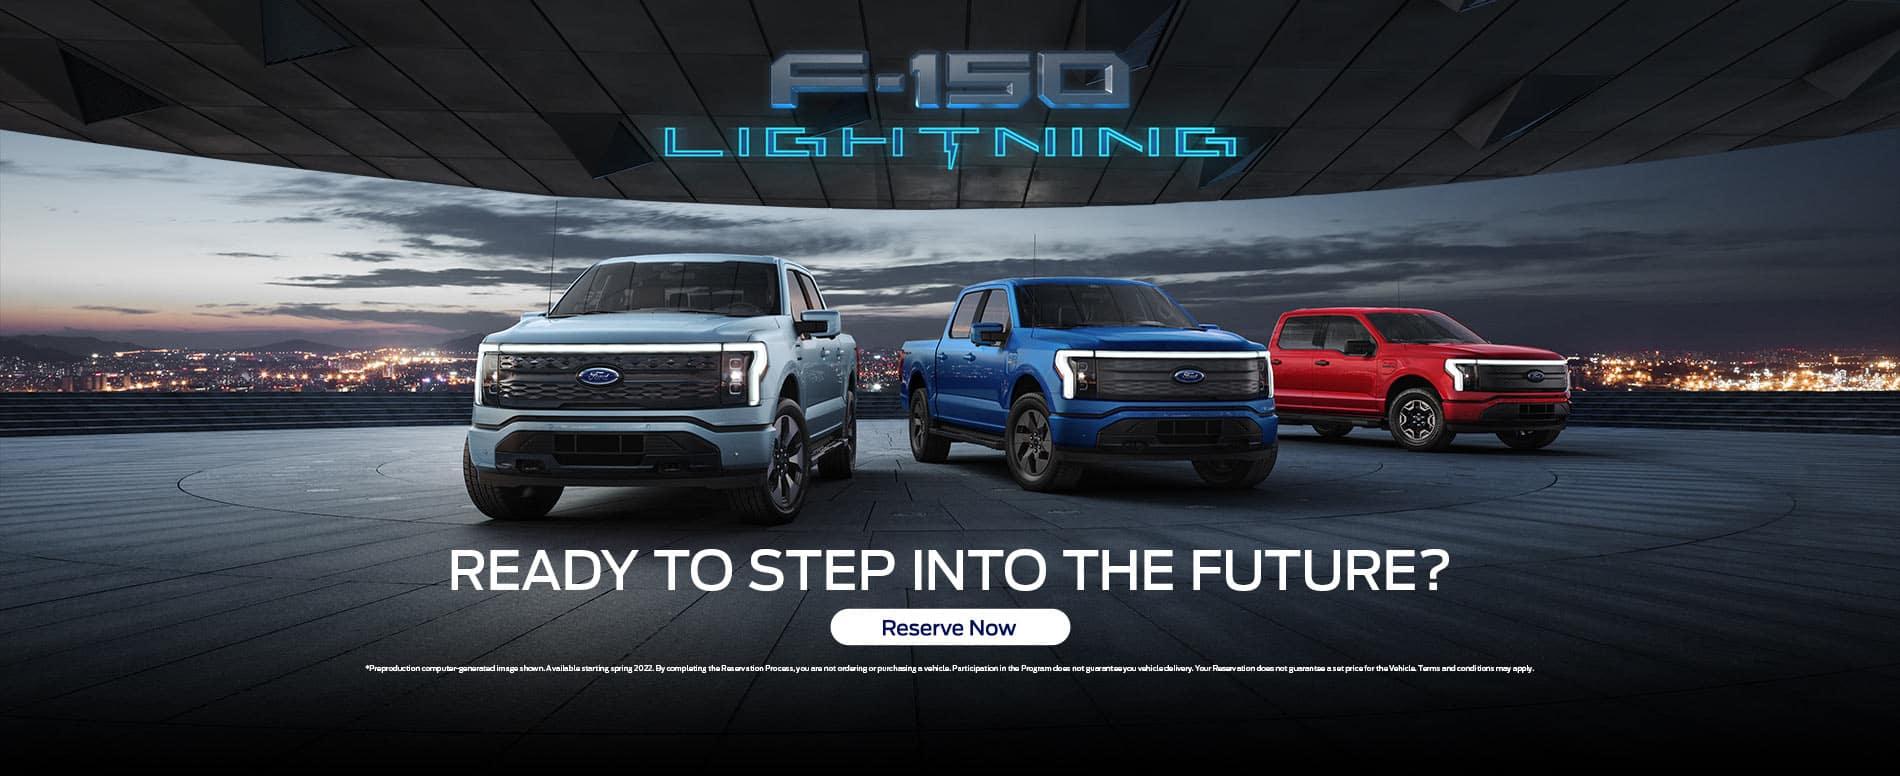 6 Ford-Sep21-F150-Lightning-Banner-1900x776